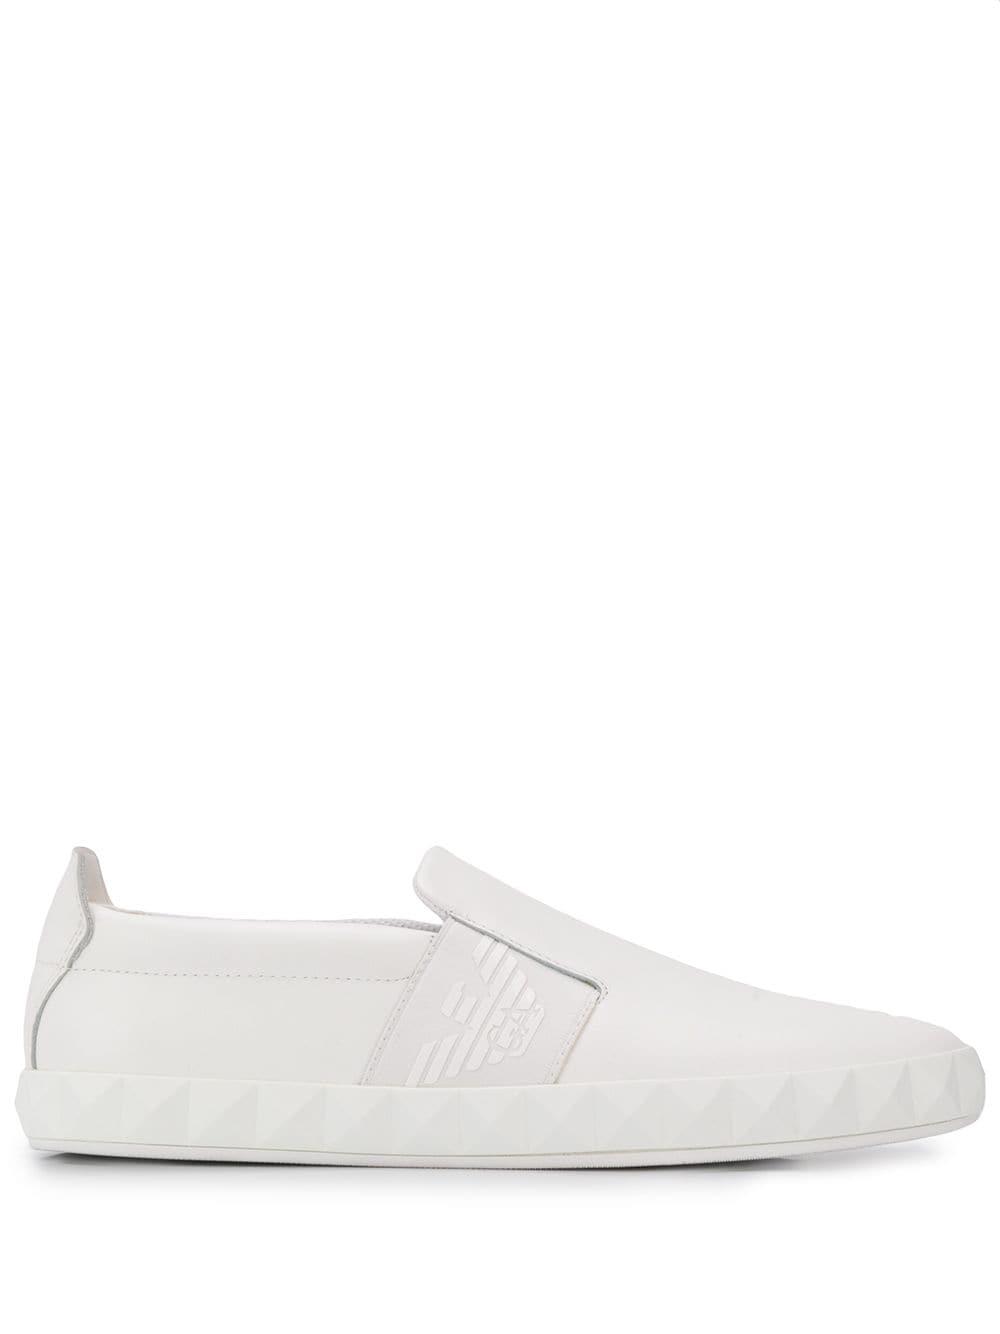 fc3ef0ac9 Emporio Armani slip-on sneakers - White in 2019 | Products | Emporio ...